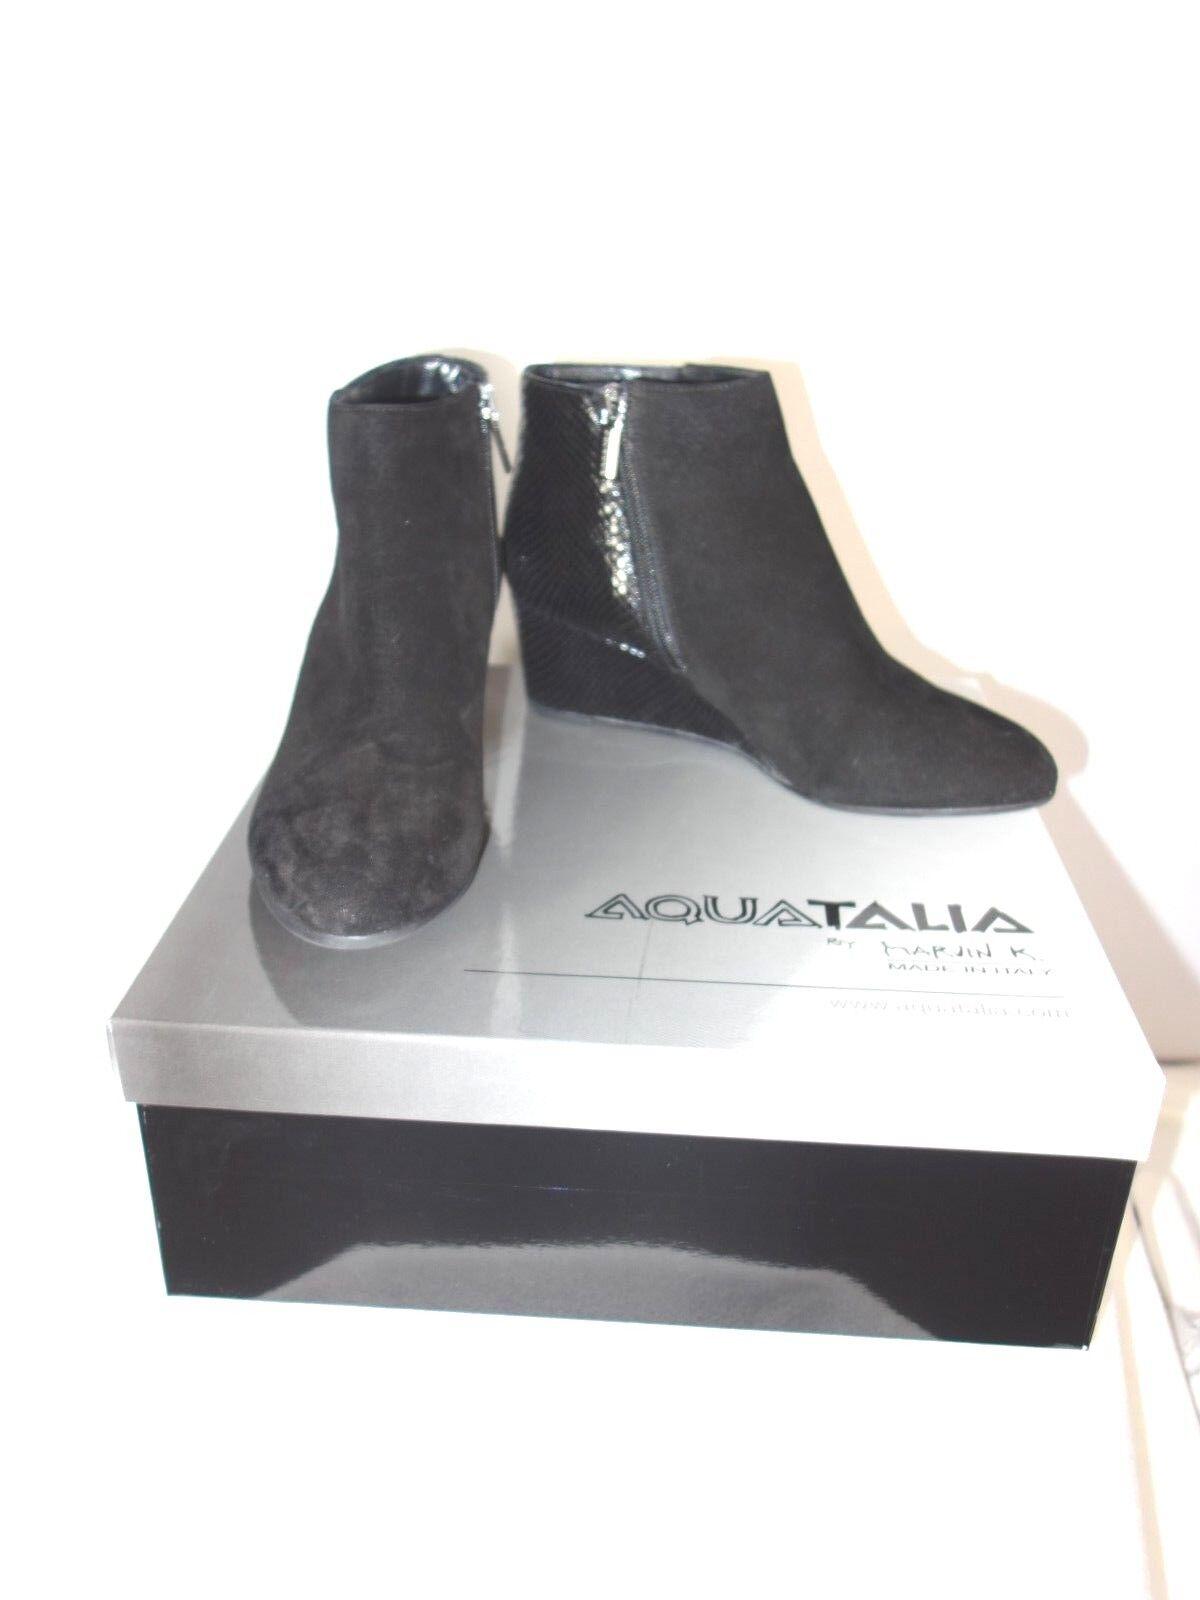 Aquatalia Weatherproof Judith Suede Biscia Black Ankle Boots Size 8 M -